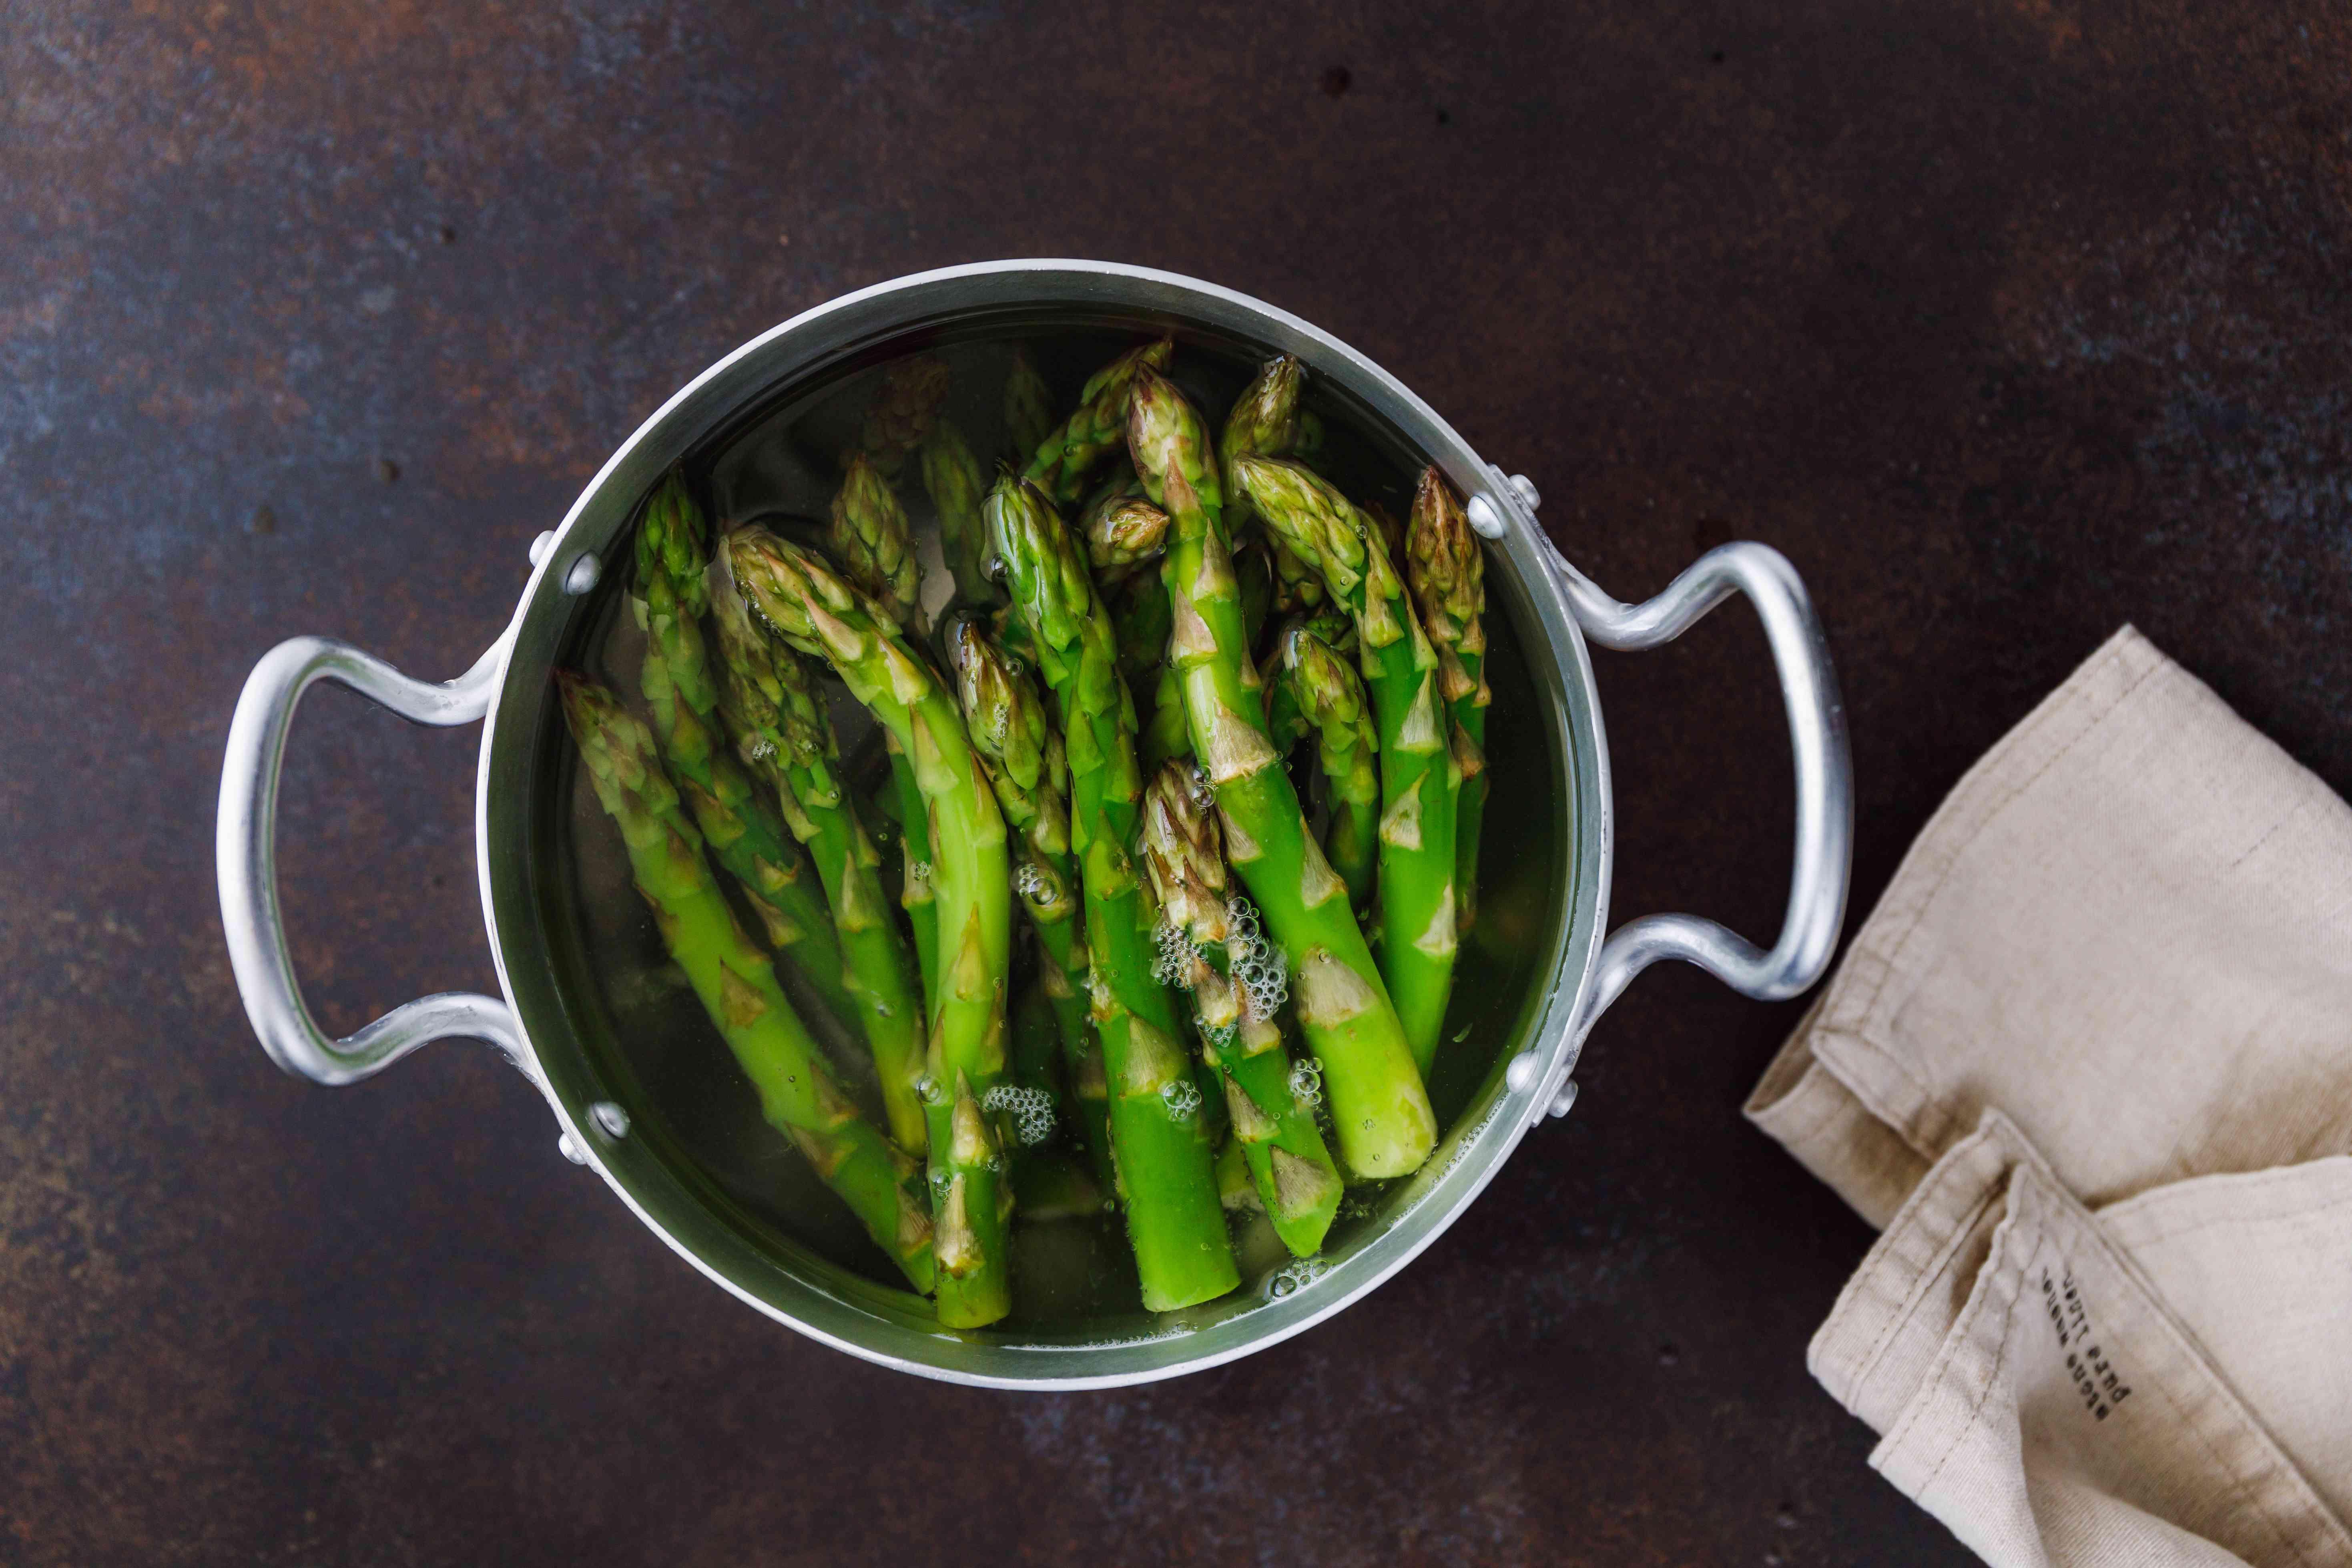 Drop in asparagus spears